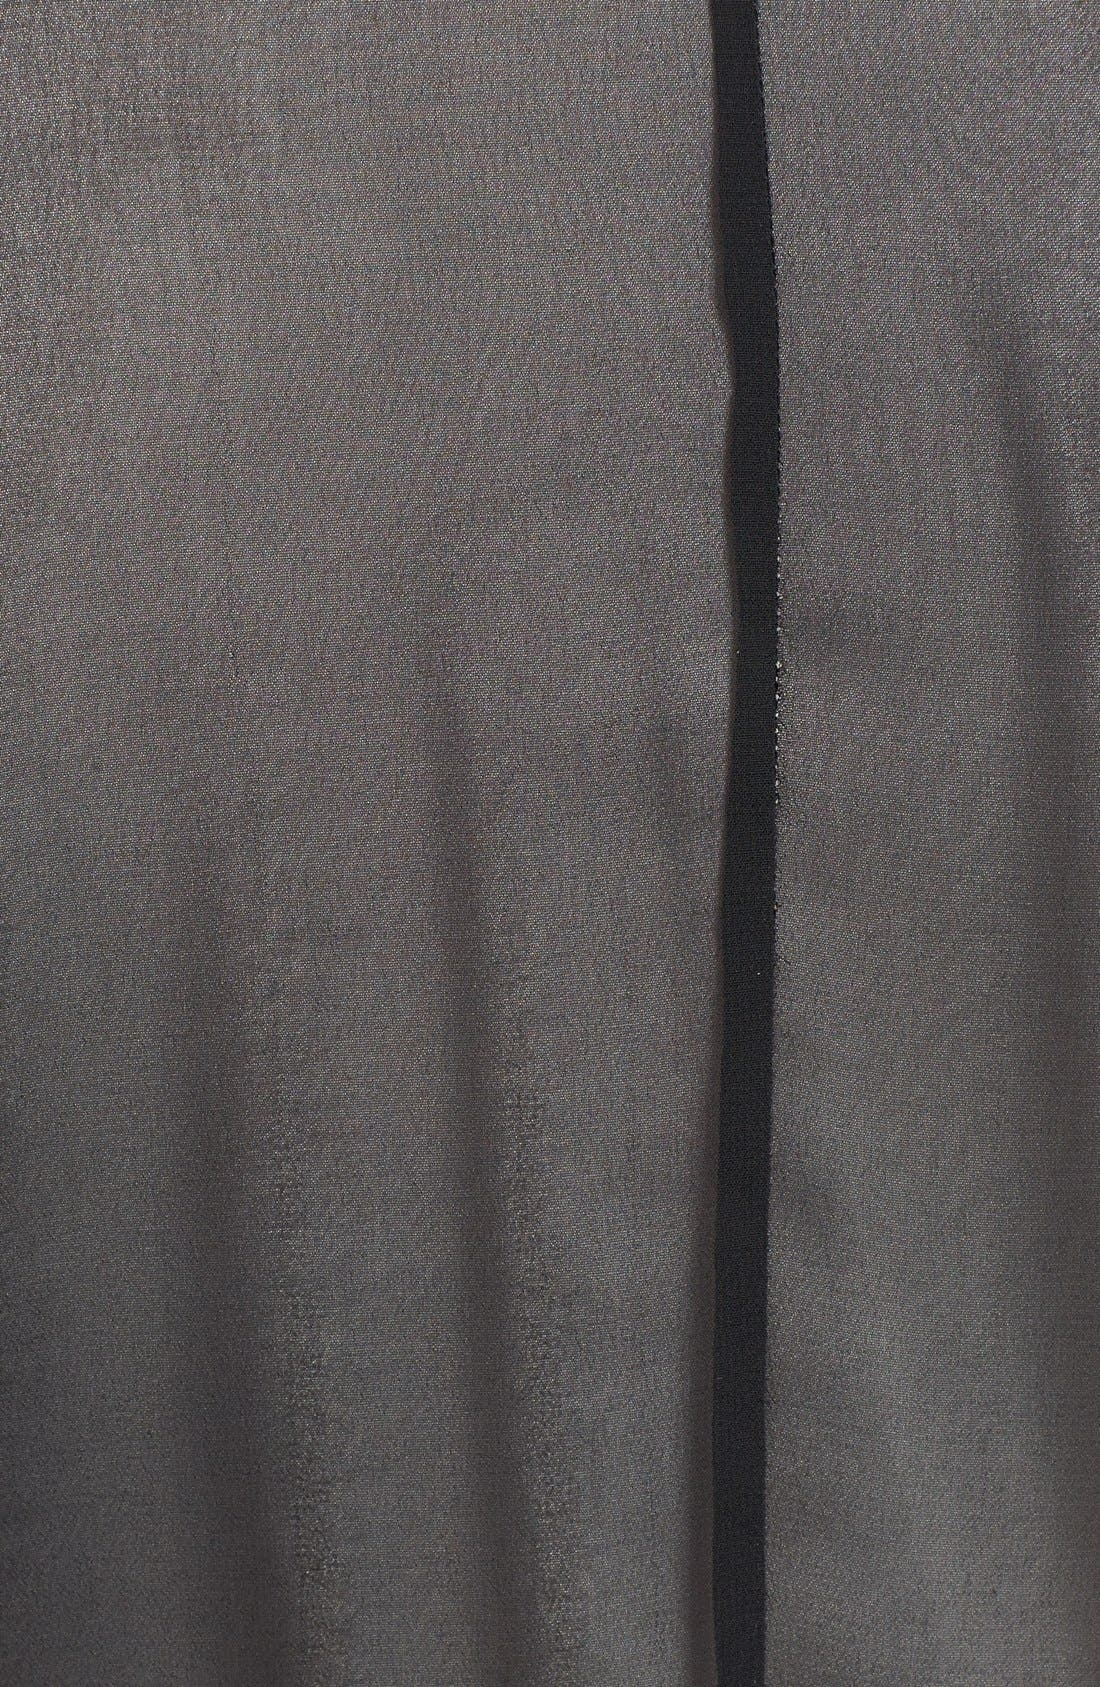 Alternate Image 3  - Vince Camuto Sheer Back Drape Front Cardigan (Plus Size)